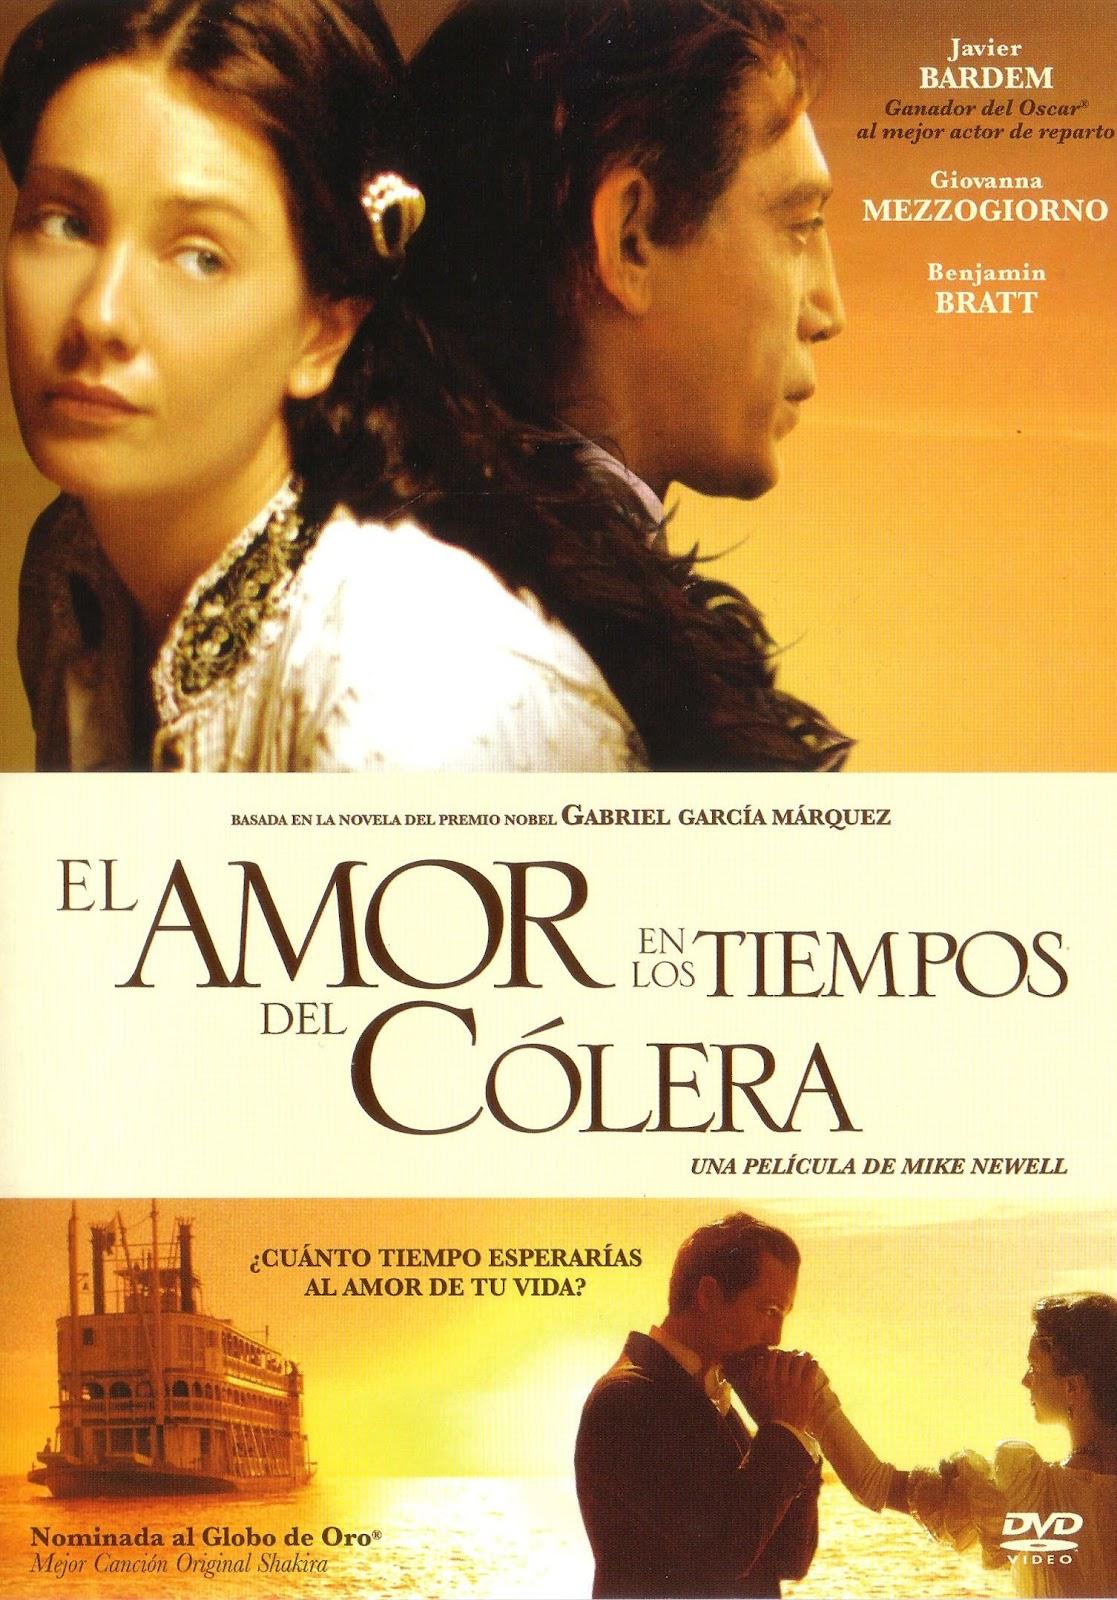 http://2.bp.blogspot.com/-UG_rFXpDac0/TzGnysUtwvI/AAAAAAAAALA/DYqmGdgkZsE/s1600/El_Amor_En_Los_Tiempos_Del_Colera_por_eltamba_%5Bdvd%5D_80.jpg